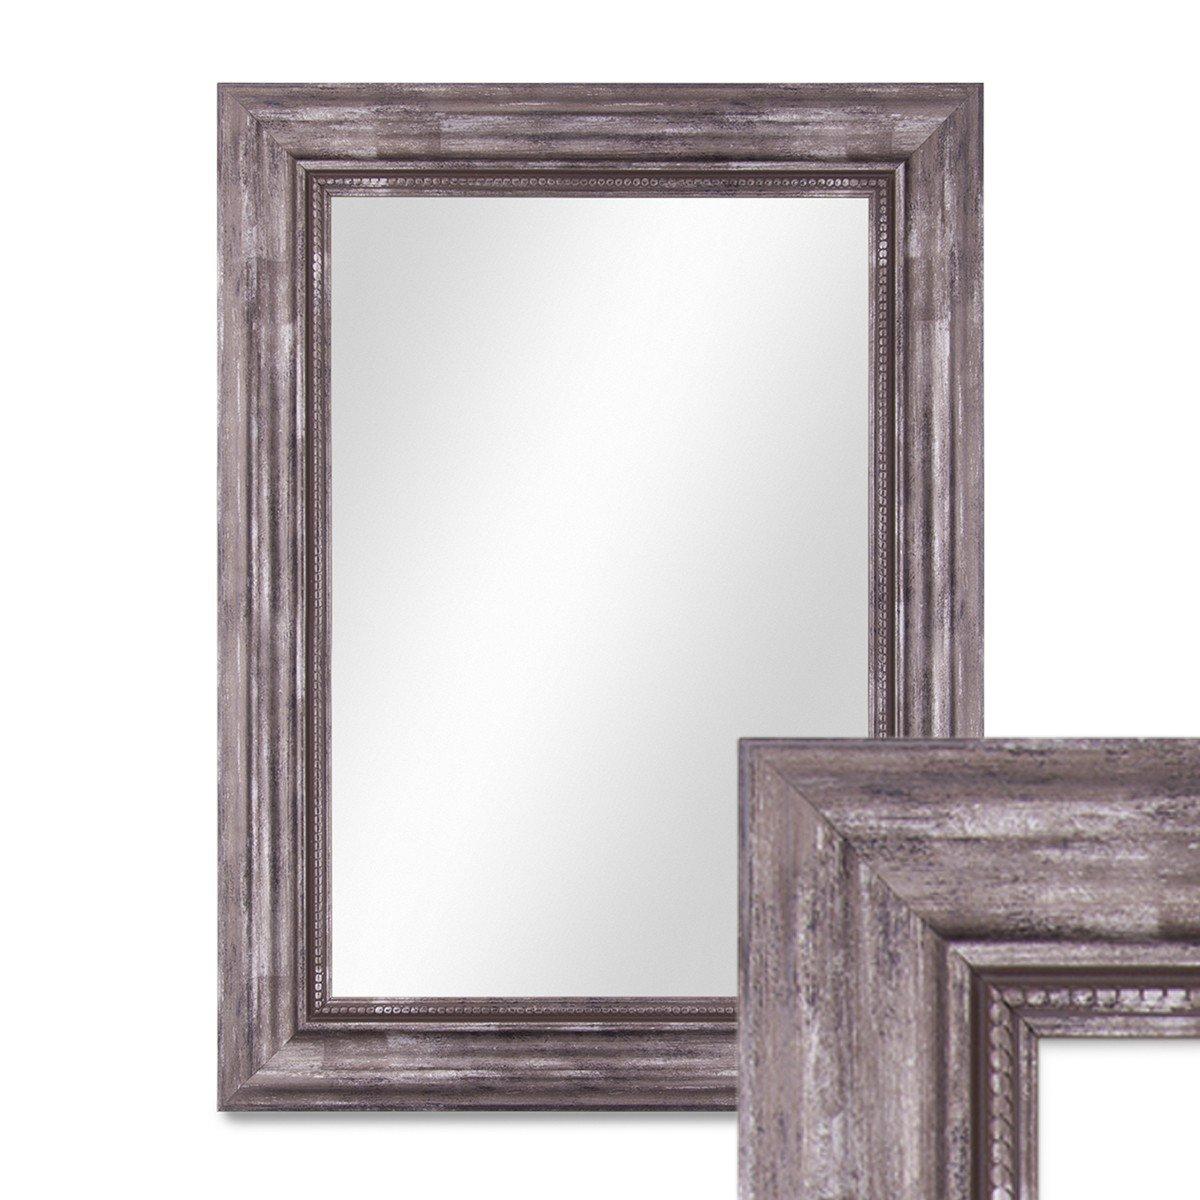 PHOTOLINI Wand-Spiegel 40x50 cm im Massivholz-Rahmen Barock-Stil Antik Silber Spiegelfläche 30x40 cm